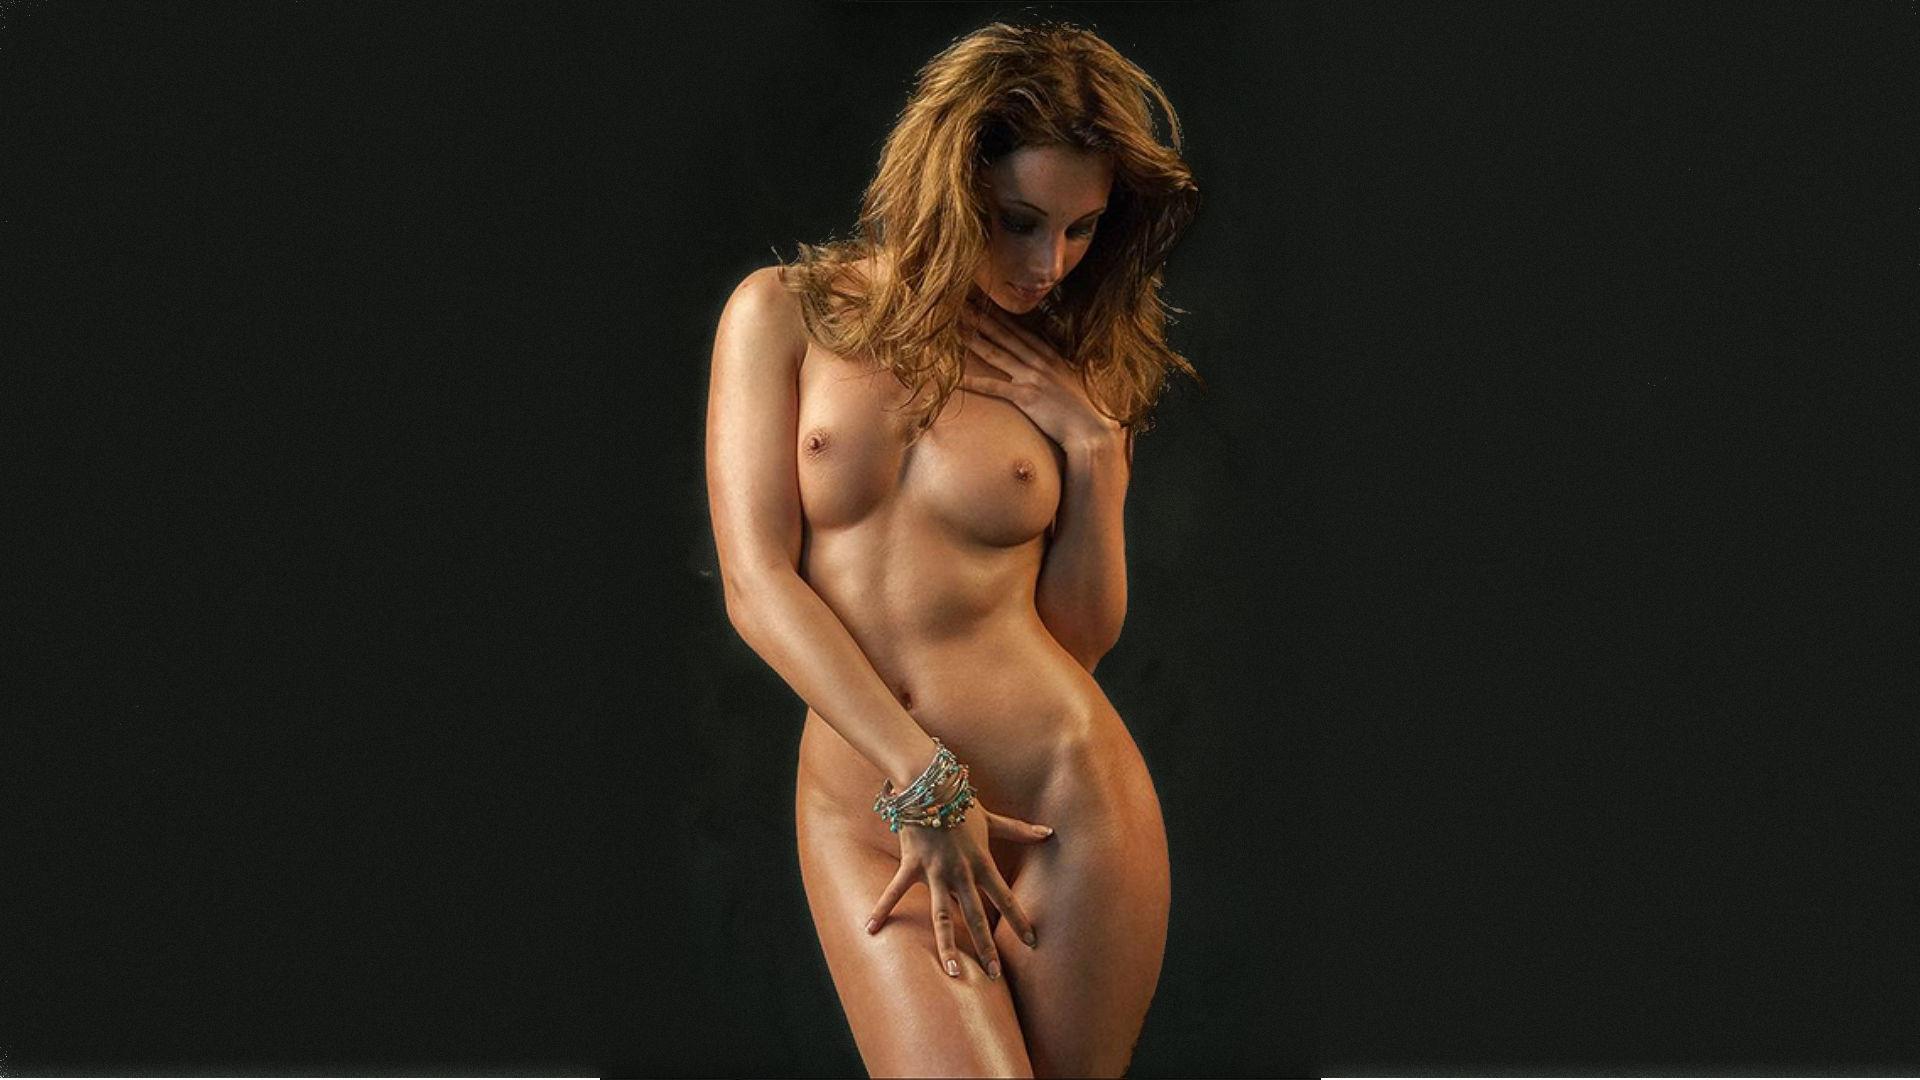 Elsa jean girl adult screensaver porn